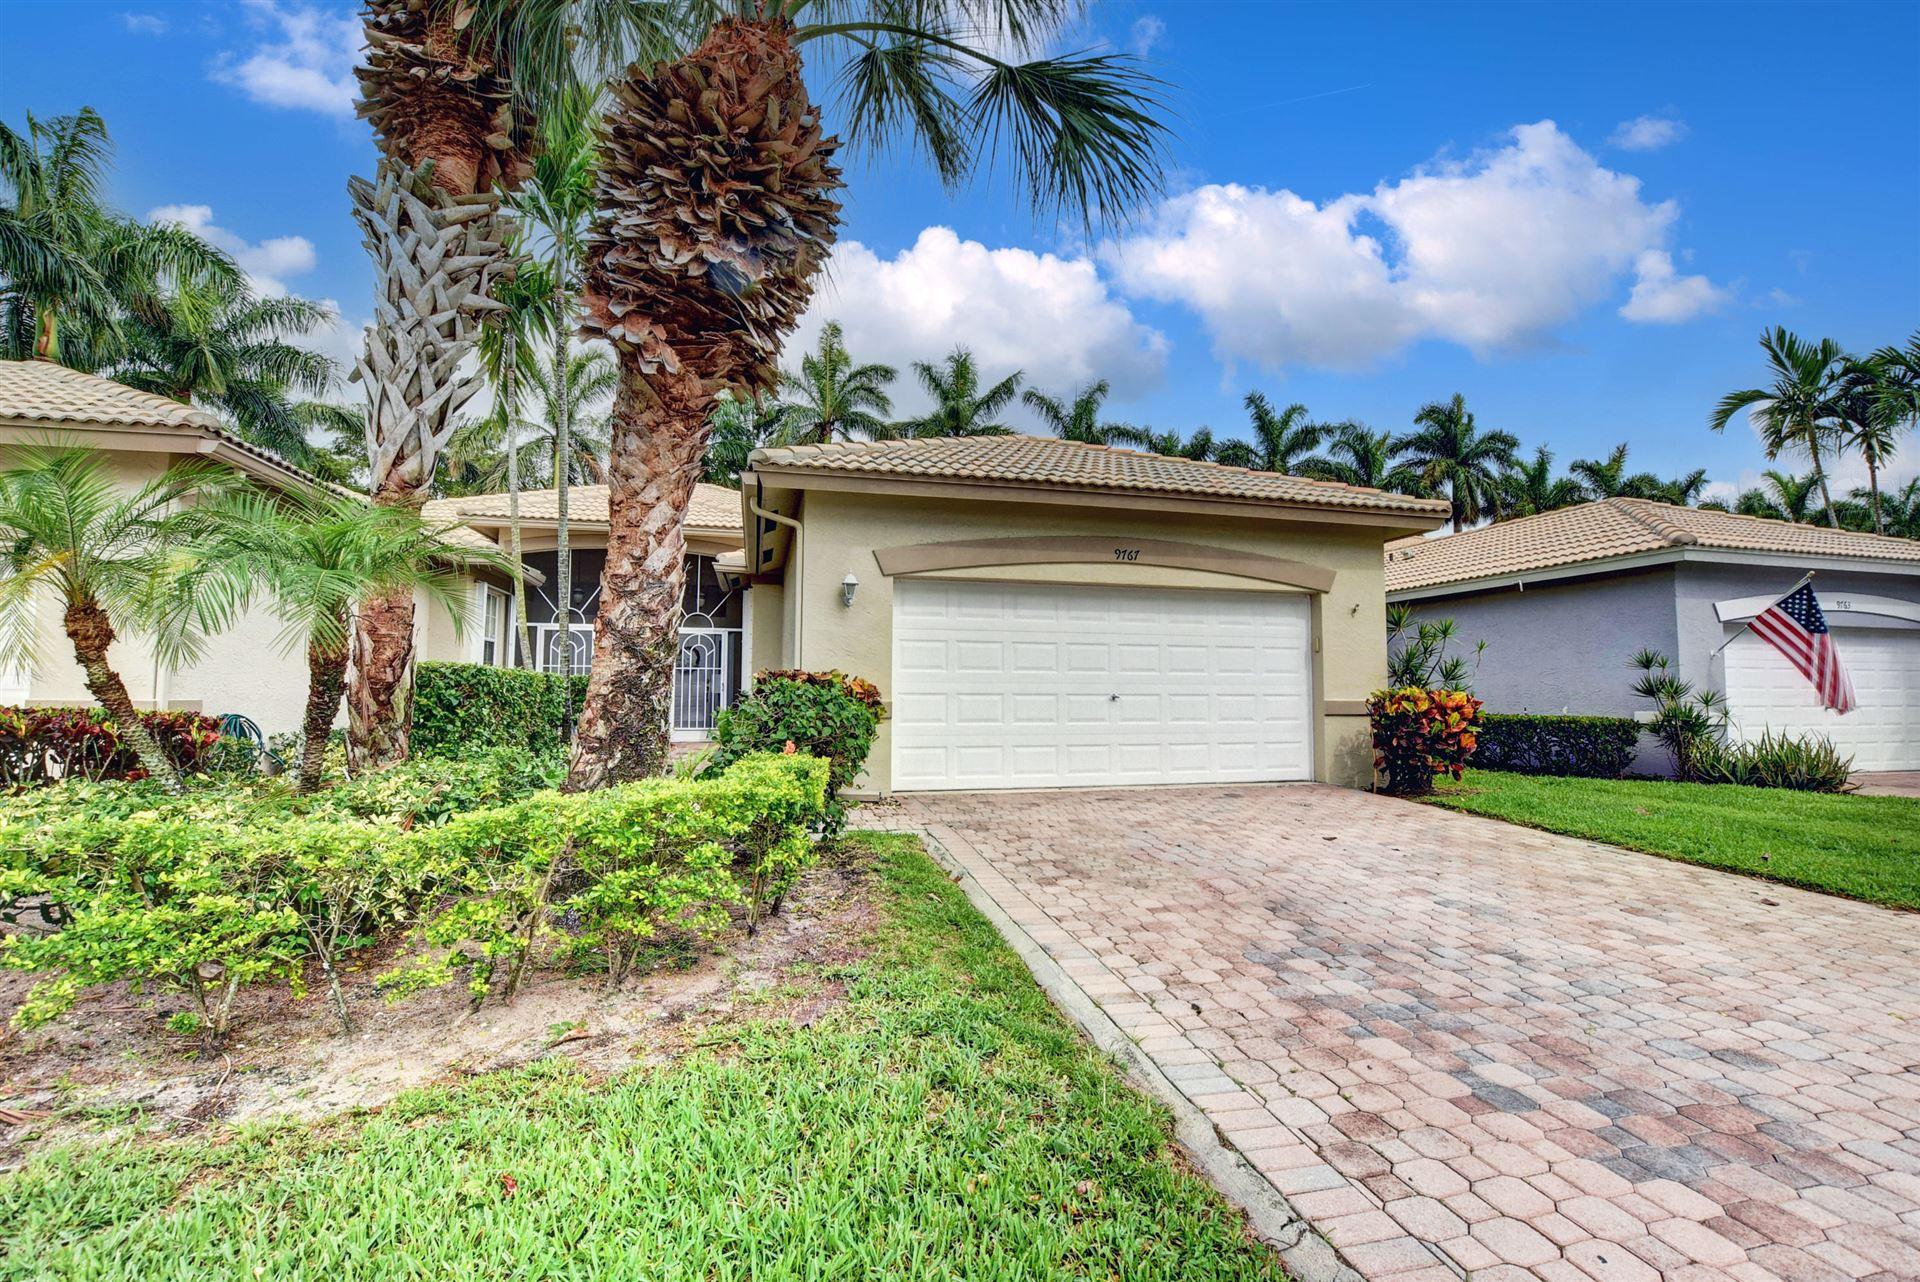 9767 S Crescent View Drive S, Boynton Beach, FL 33437 - MLS#: RX-10726880